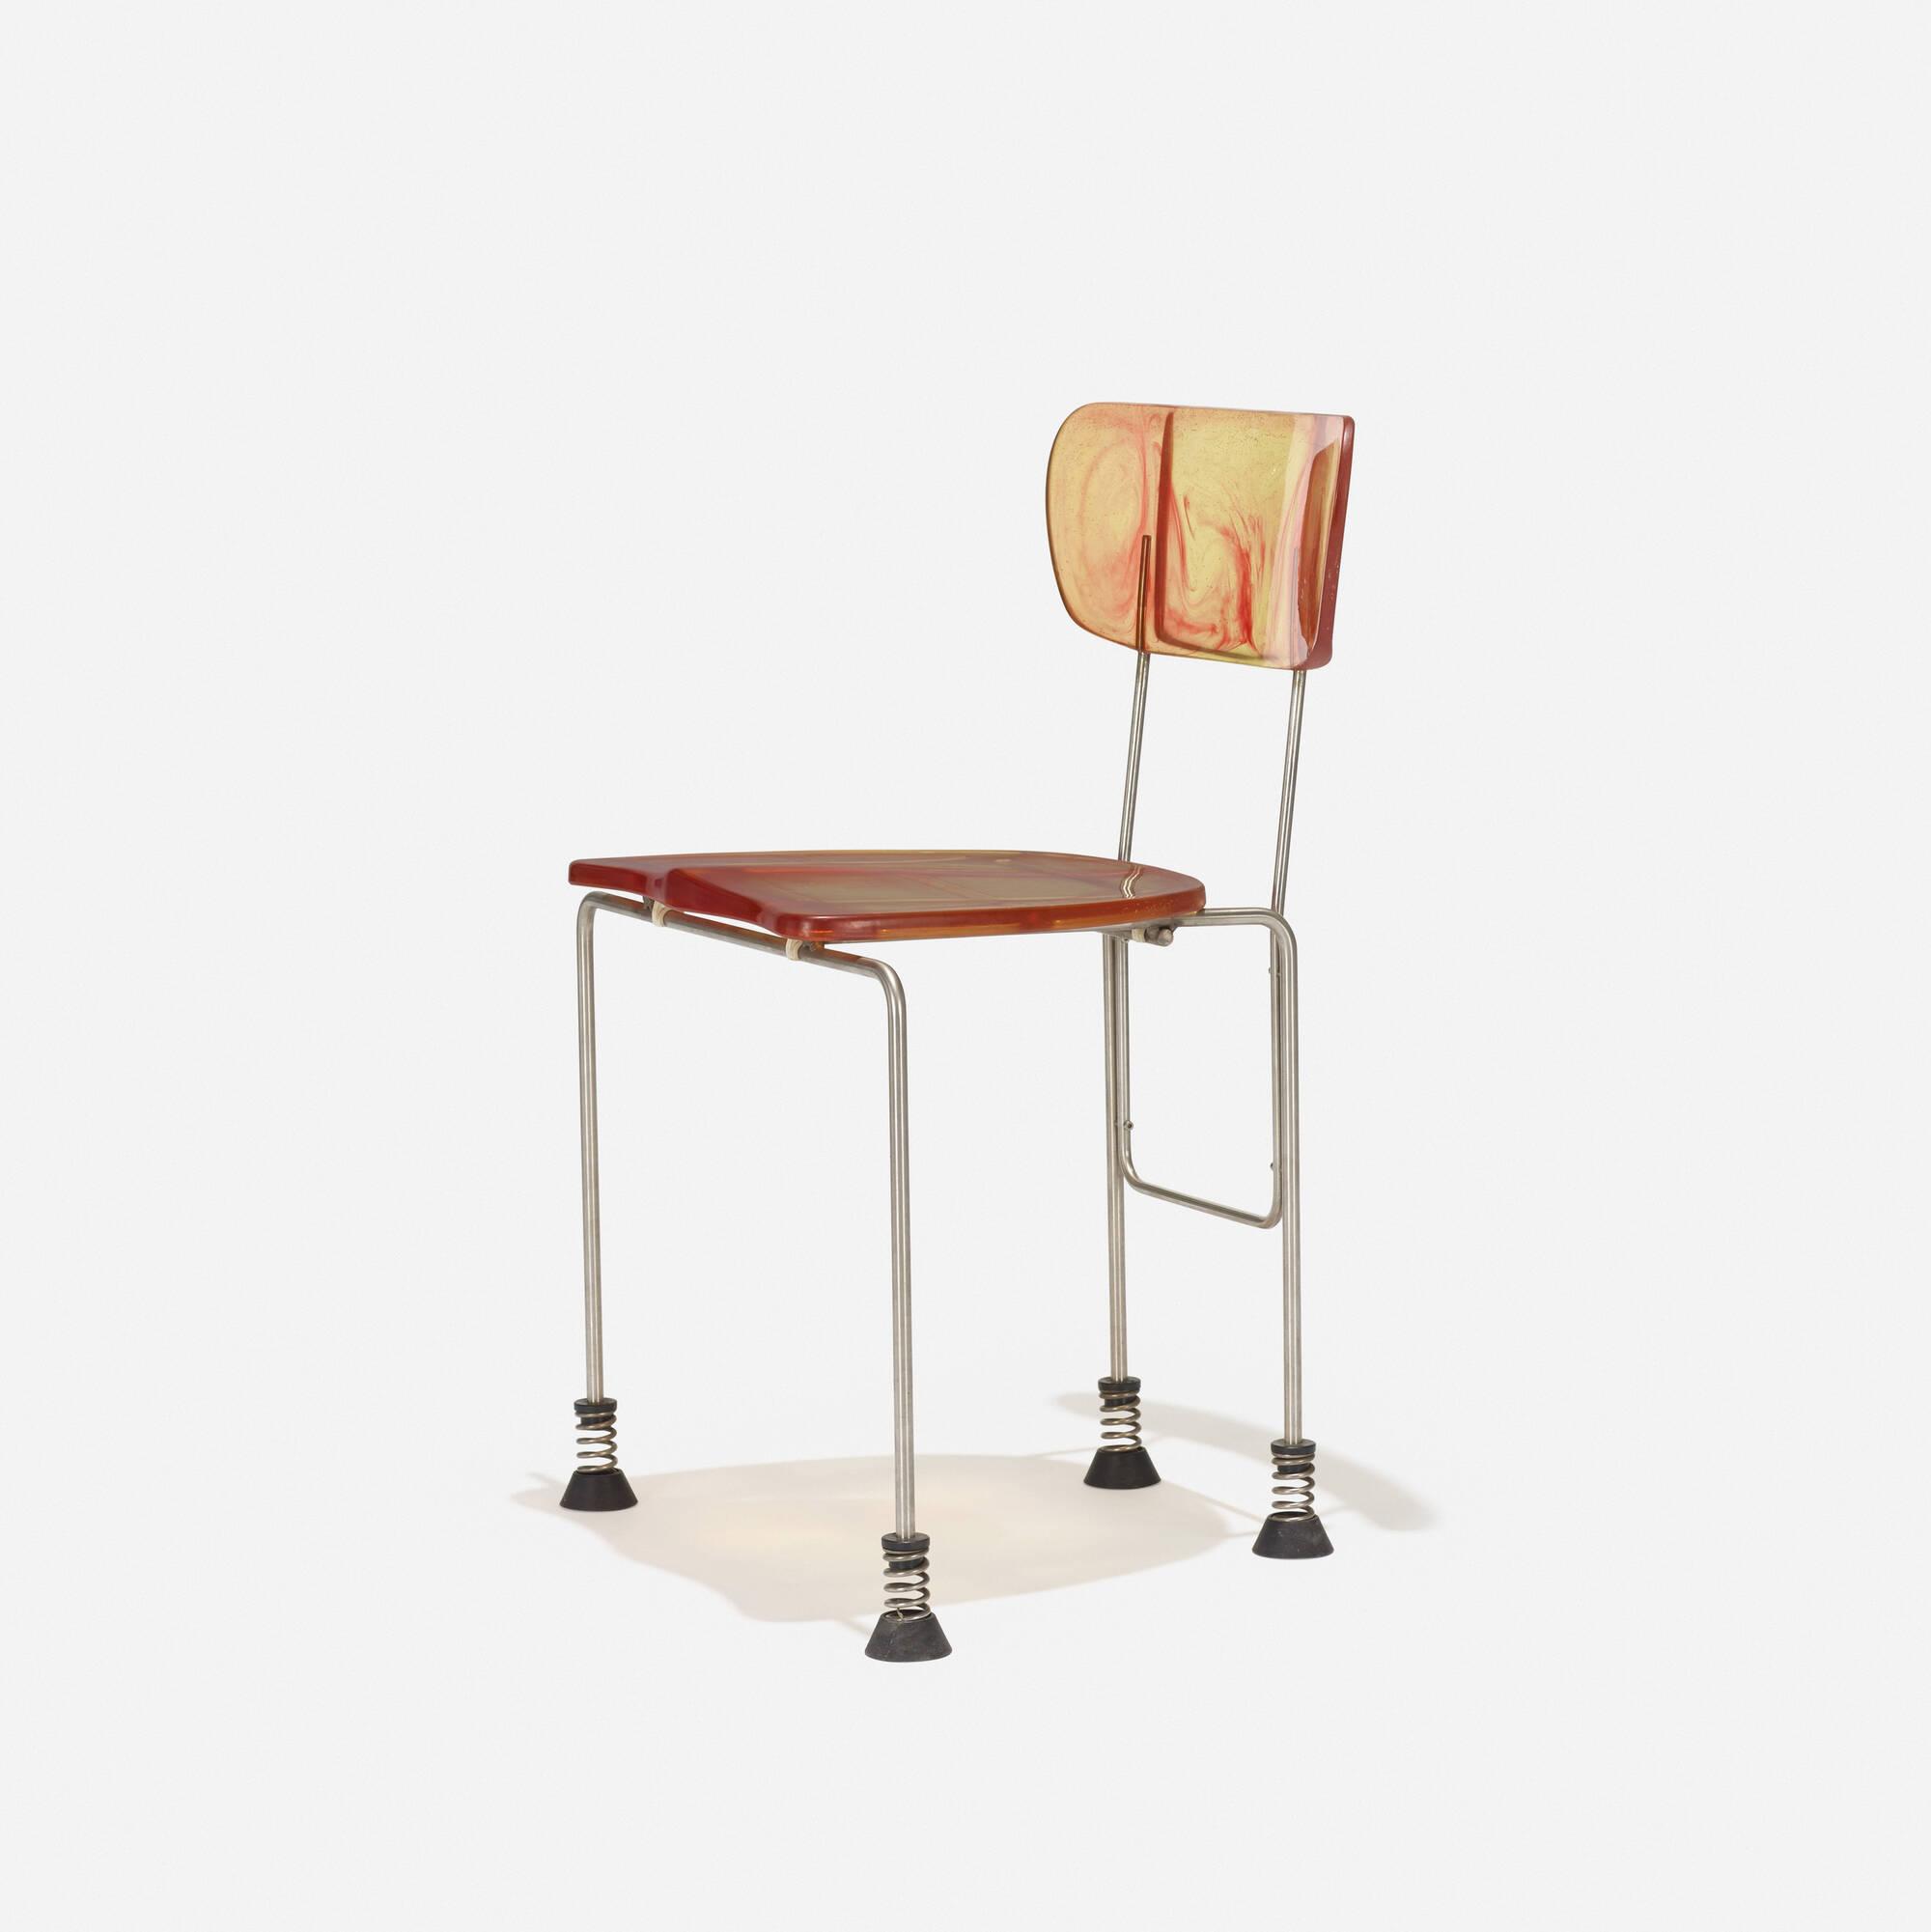 327: Gaetano Pesce / 543 Broadway chair (2 of 4)